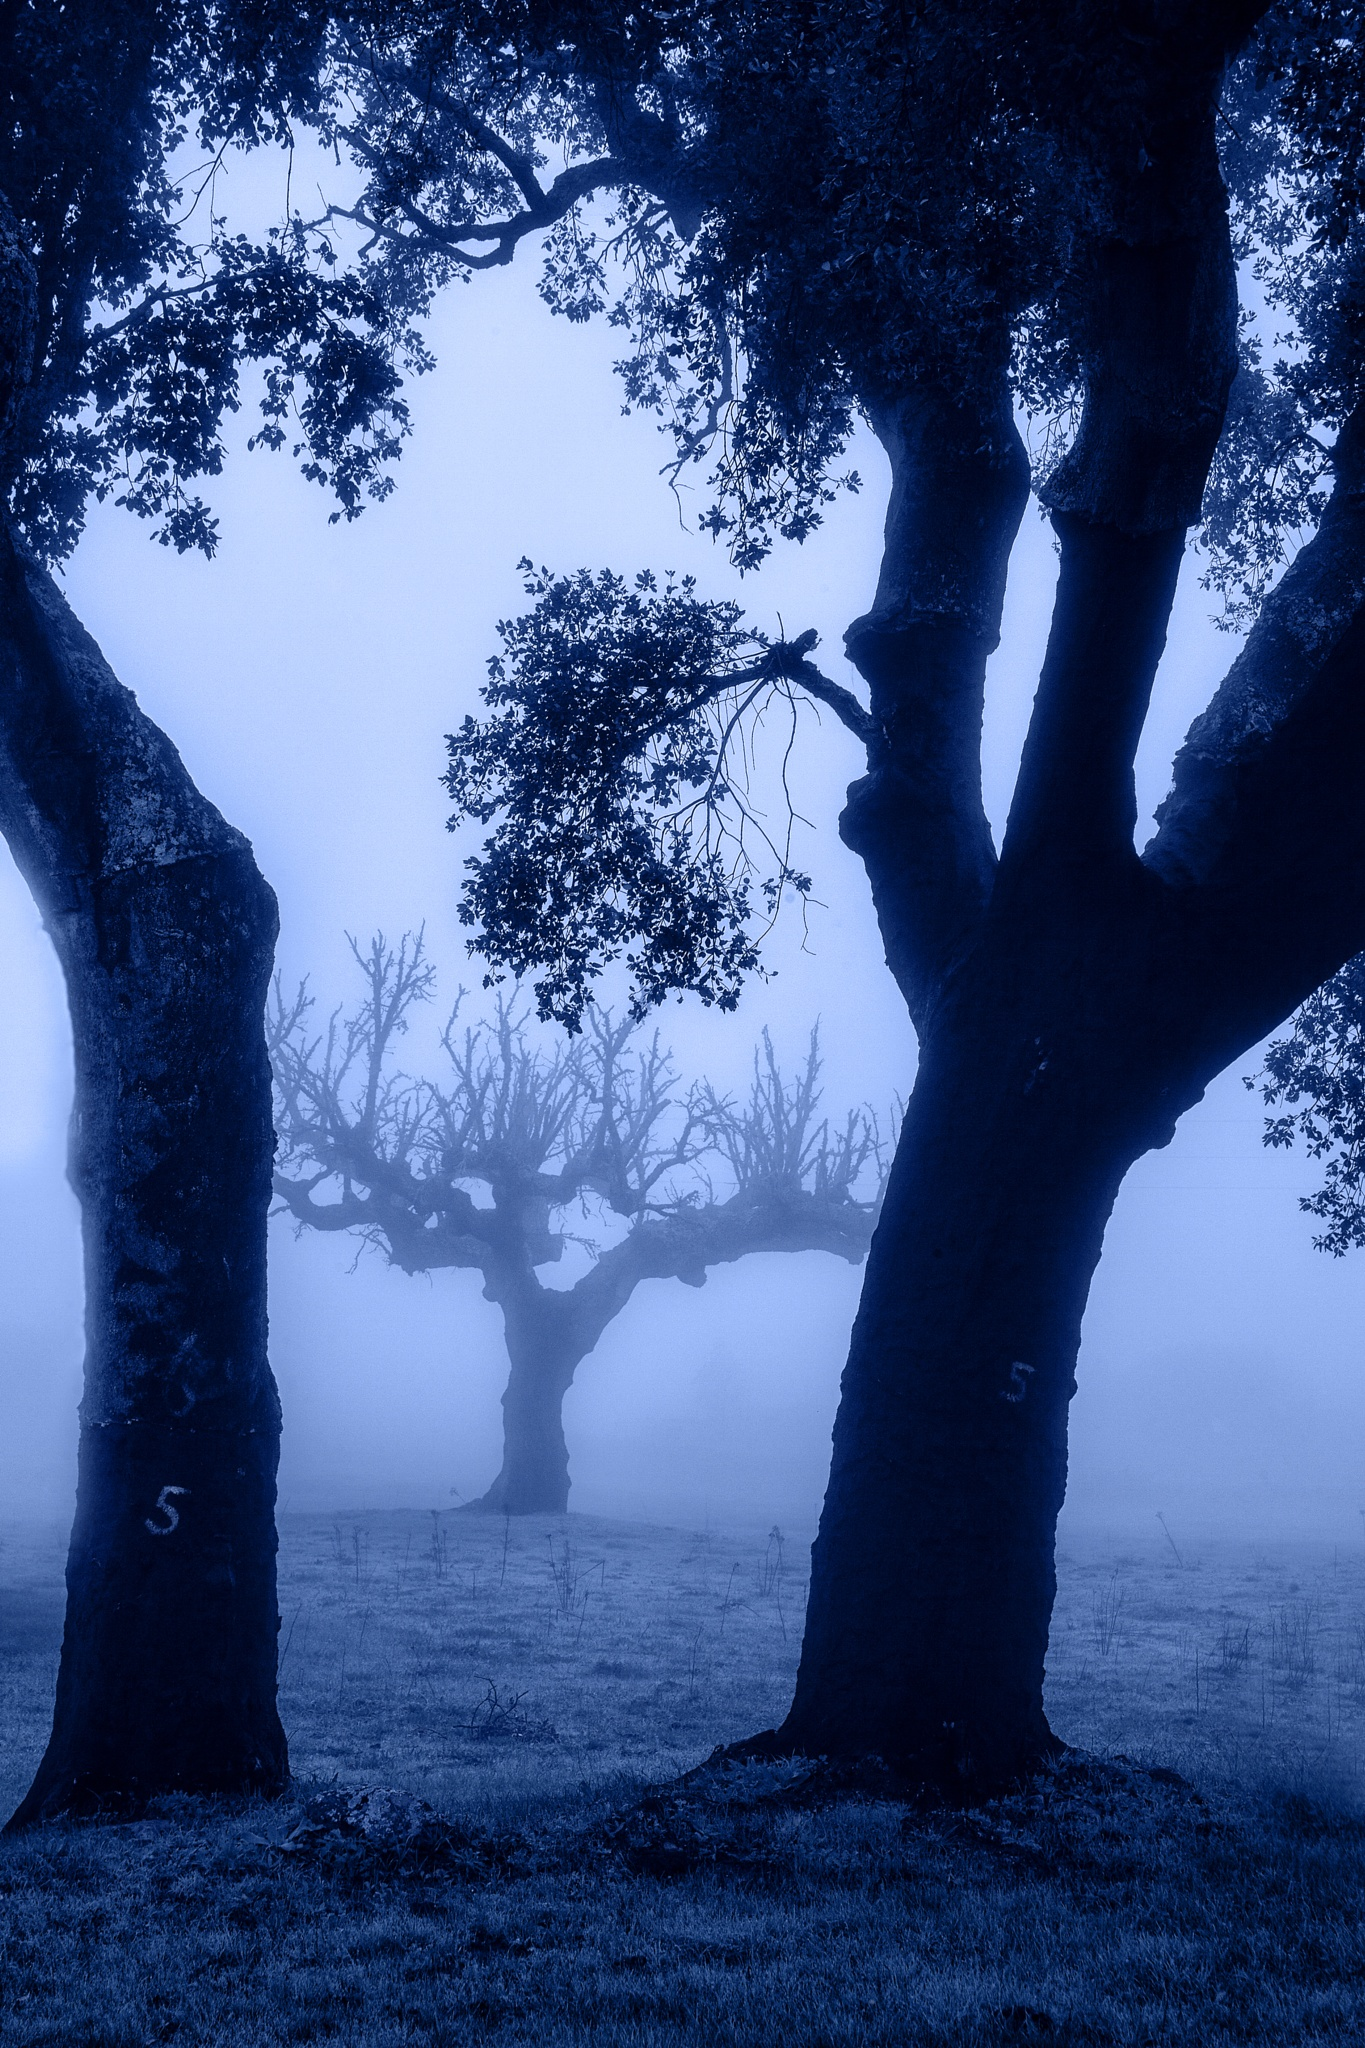 misty blues by melanie bund martins